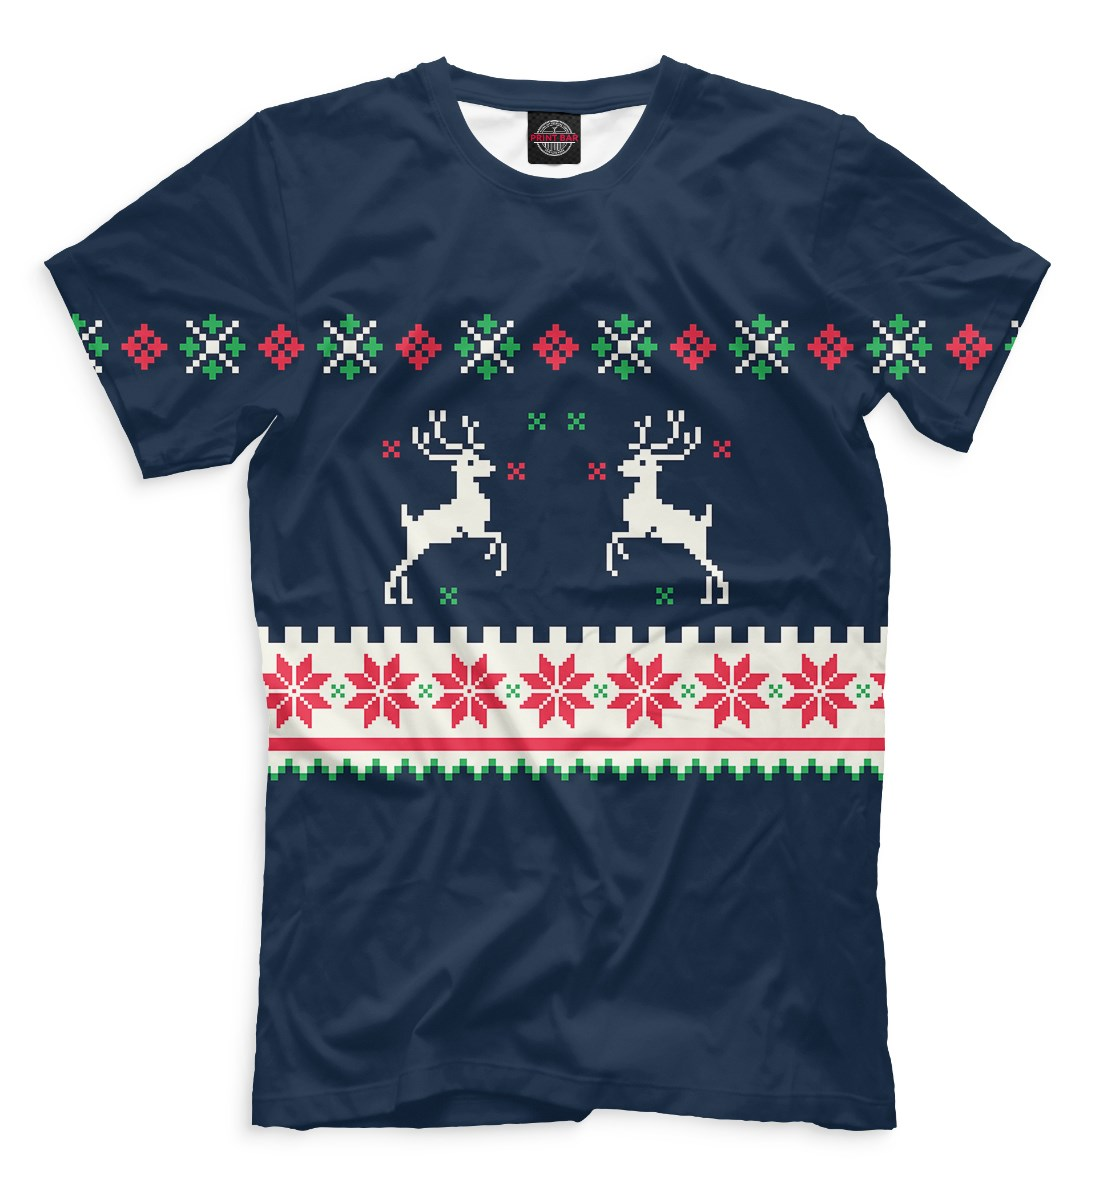 Синяя мужская футболка Свитер с оленями